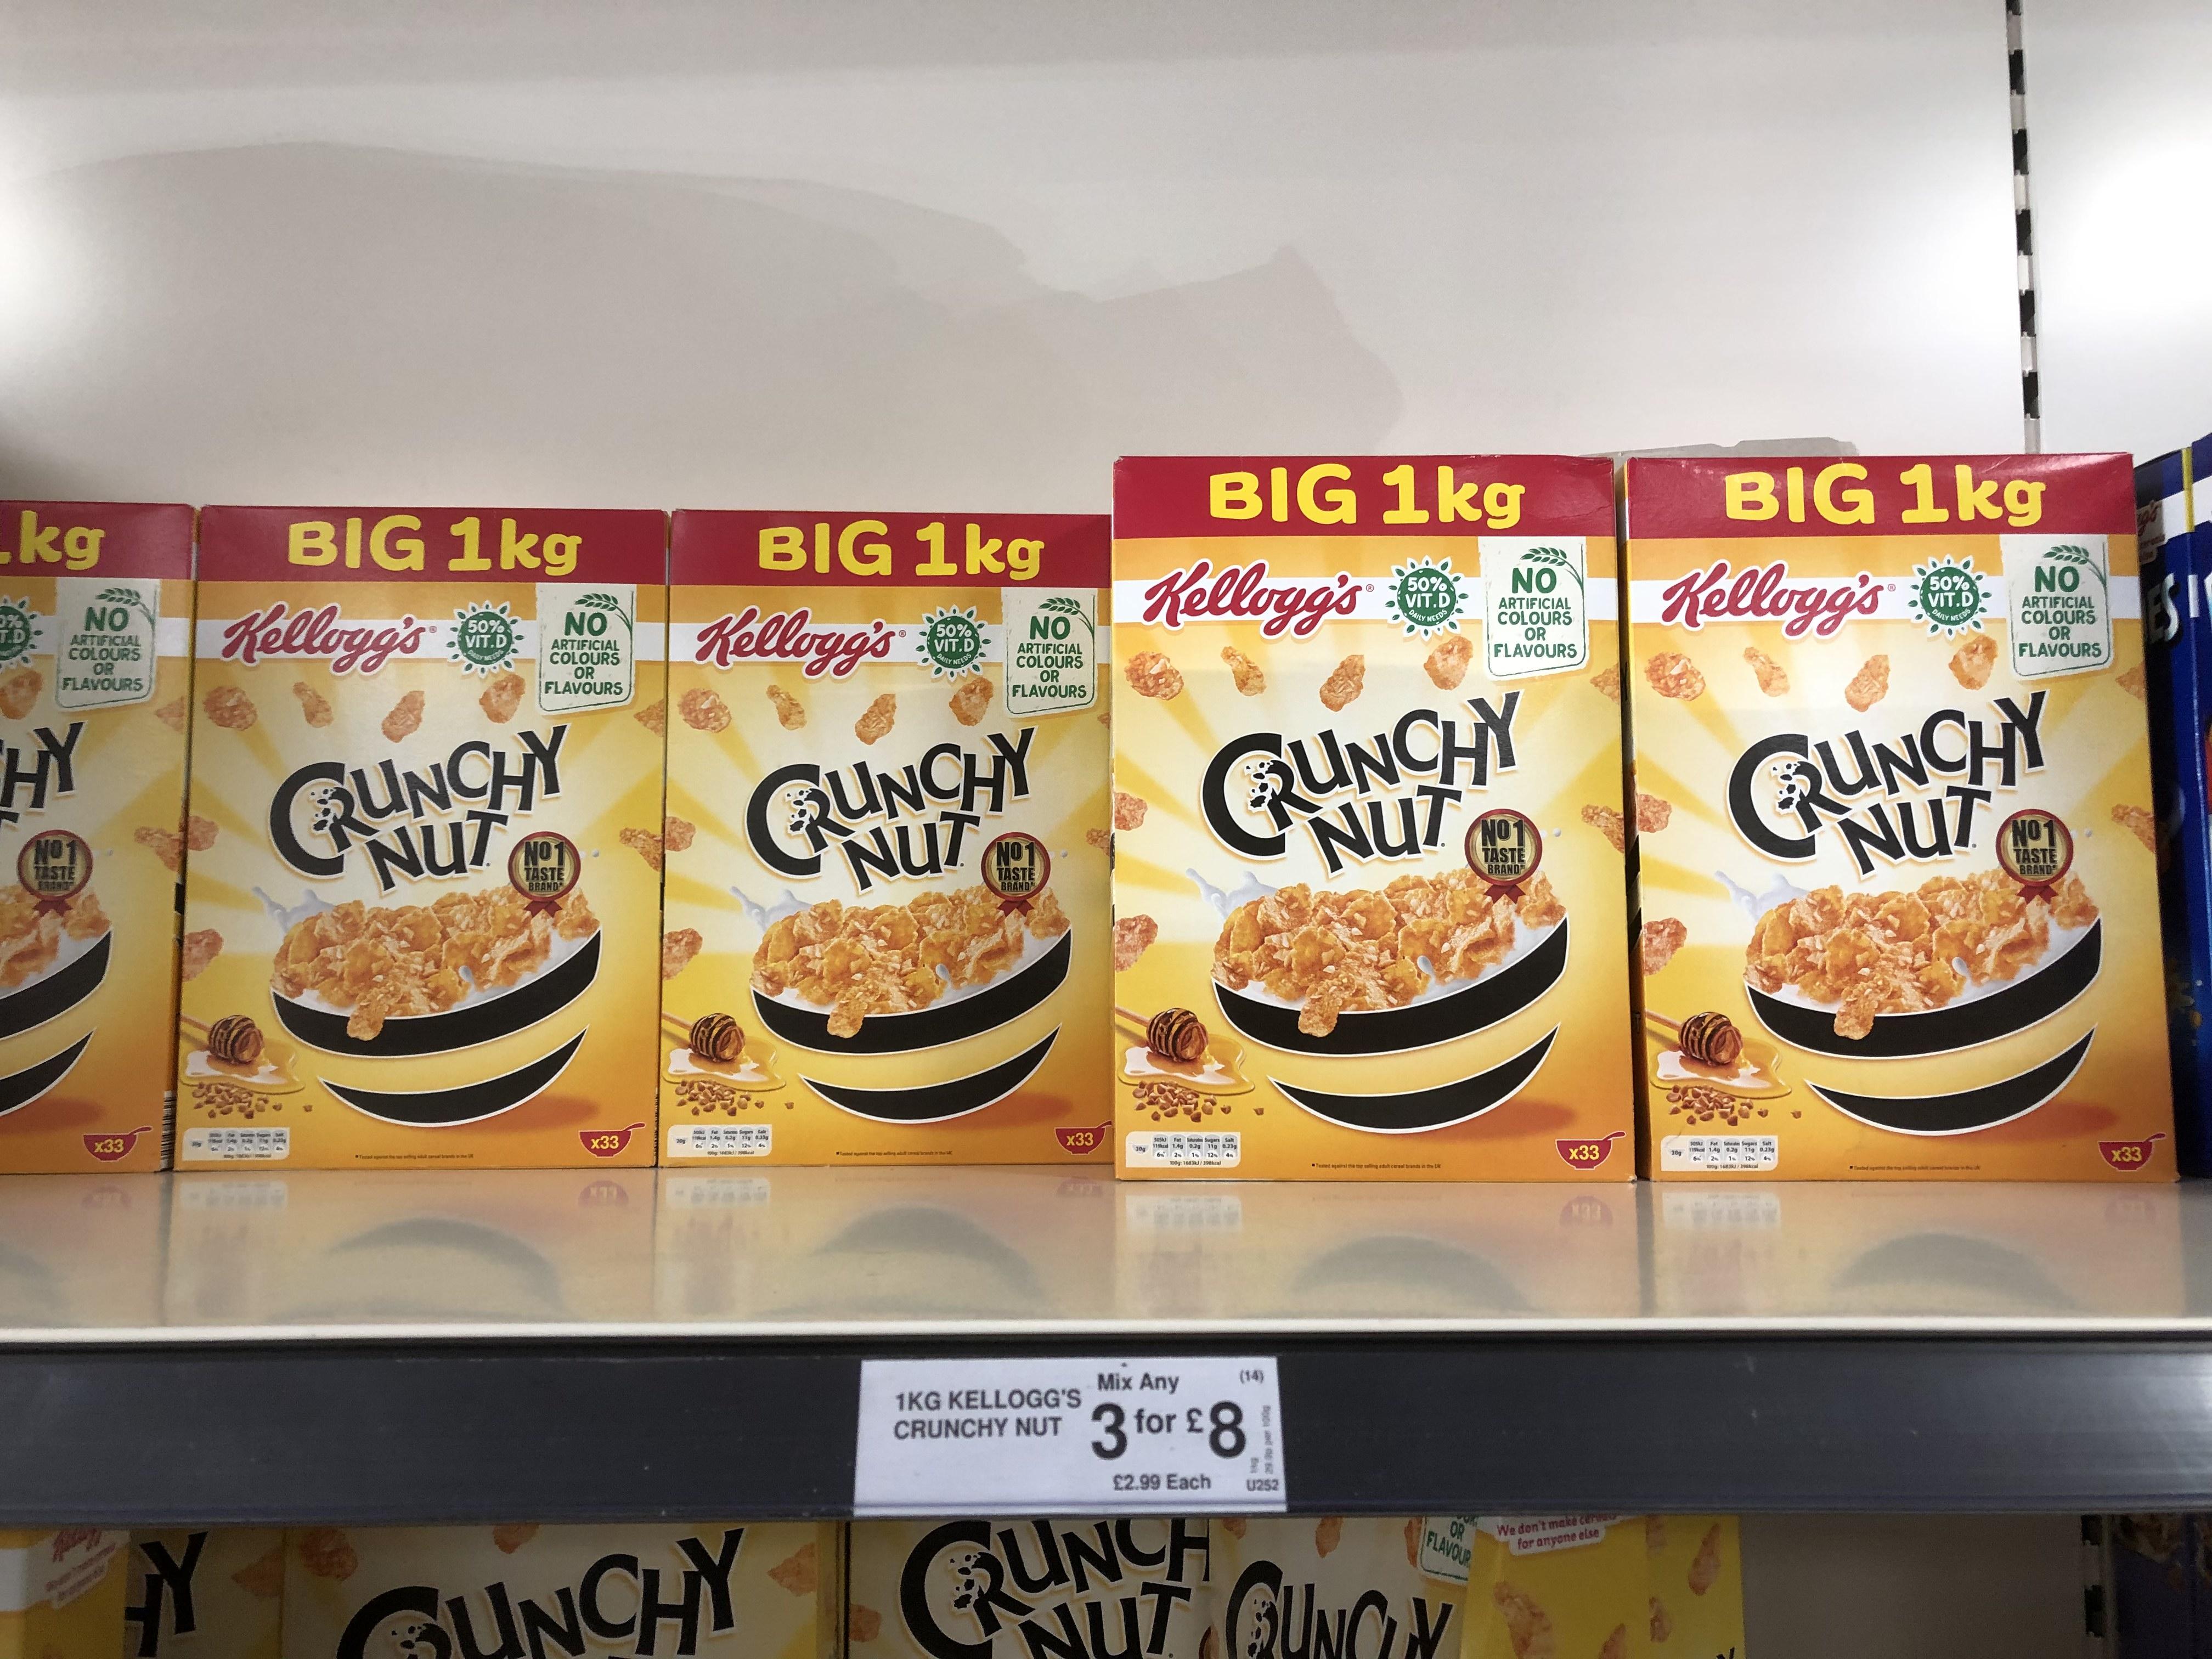 1kg Kellogg's Crunchy Nut cornflakes  box. 3 for £8 in Aldi Bradford